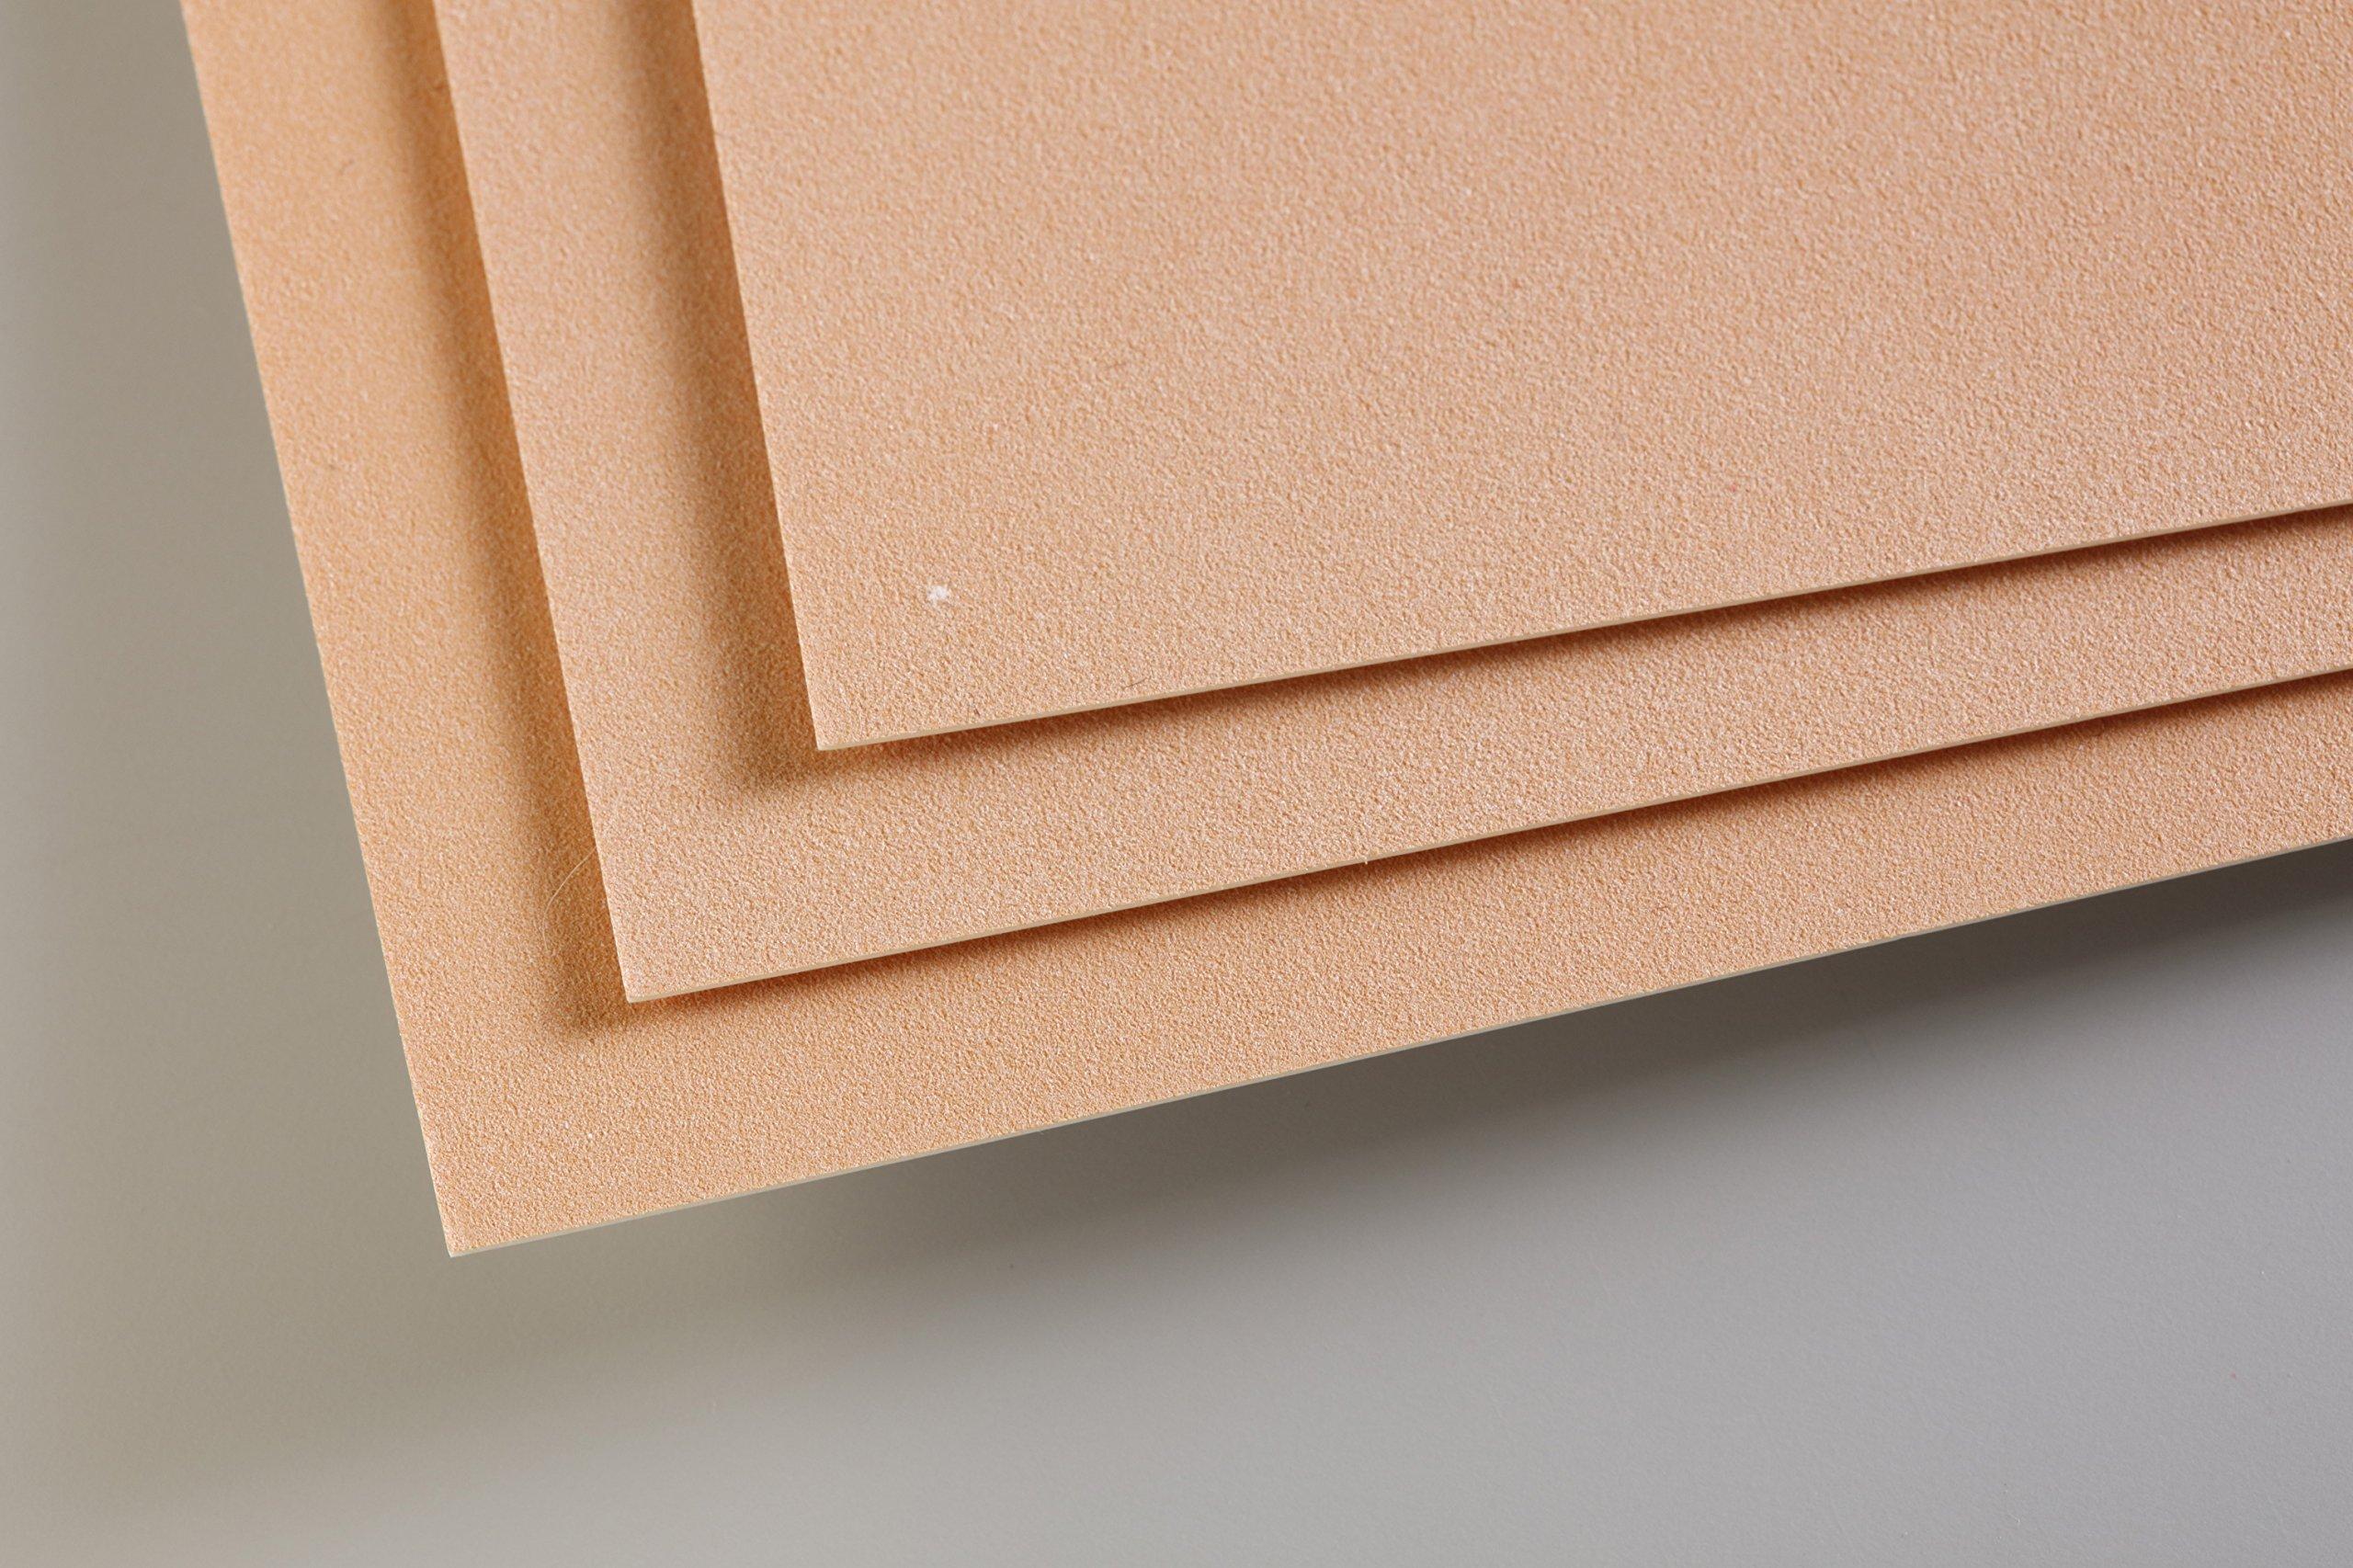 EXTREMITY (Bellaphon) Clairefontaine PastelMat 50 x 70 cm Sheets, 360 g, Sienna, 5 Sheets by EXTREMITY (Bellaphon) (Image #1)